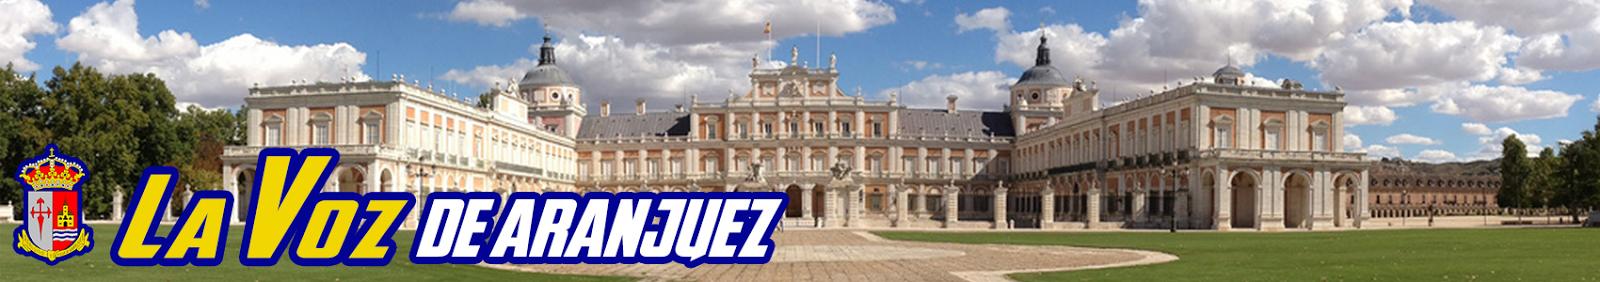 La Voz de Aranjuez